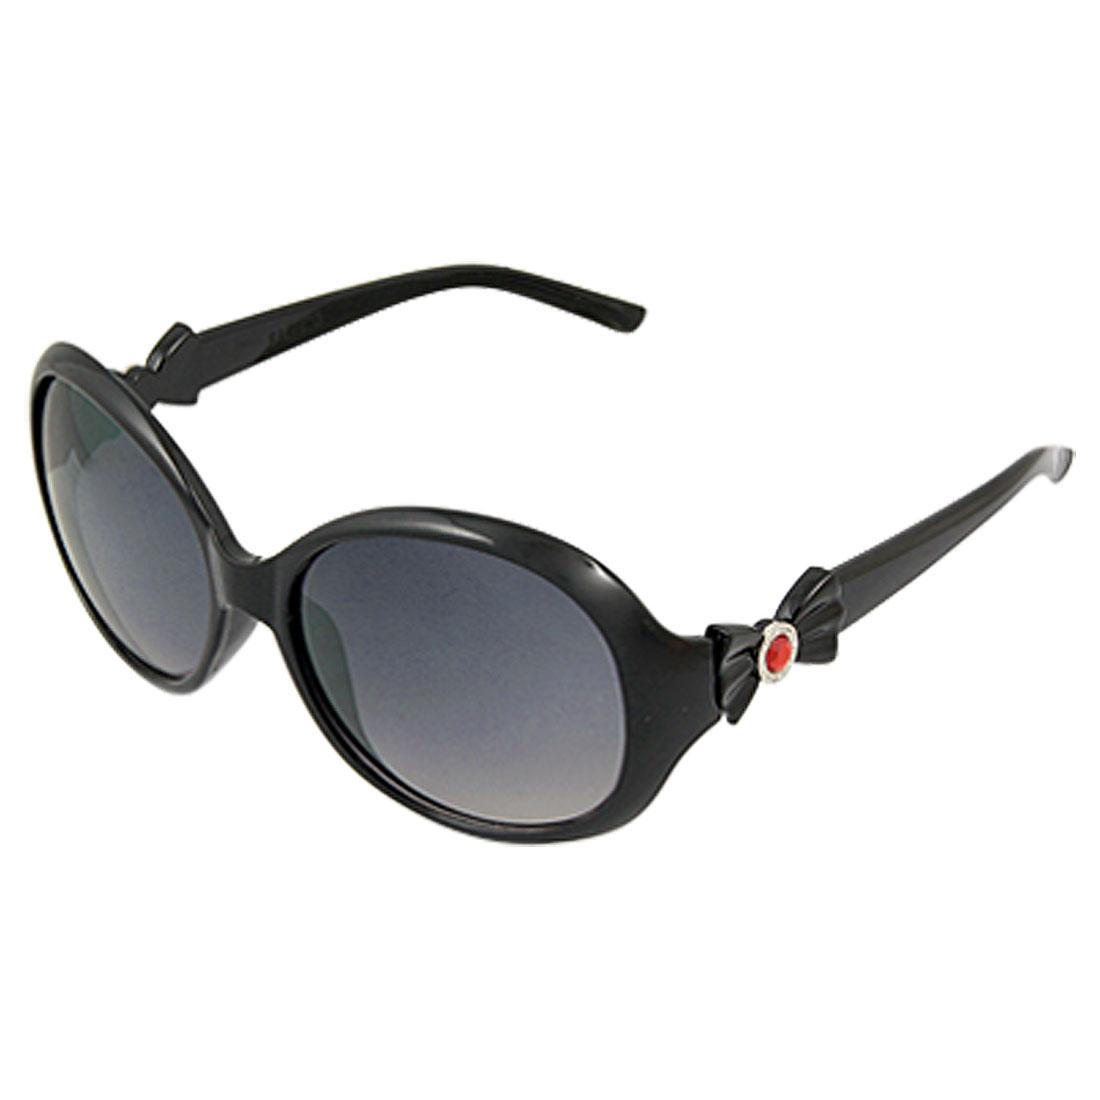 Lady Black Single Bridge Bowtie Accent Plastic Sunglasses